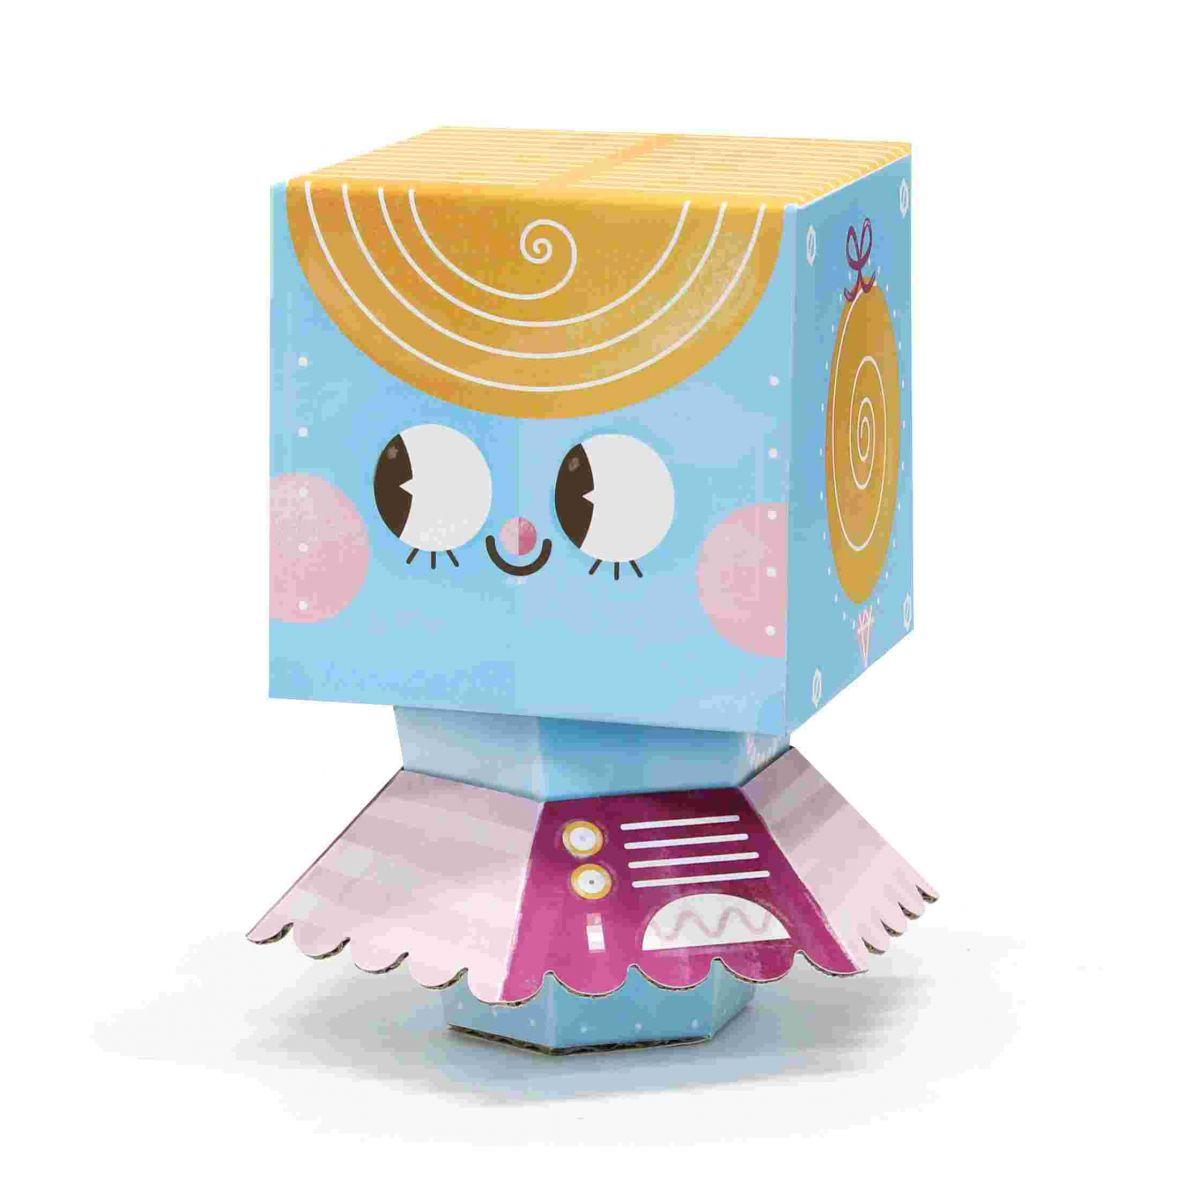 Robô de Brincar Bailarina - Krooom